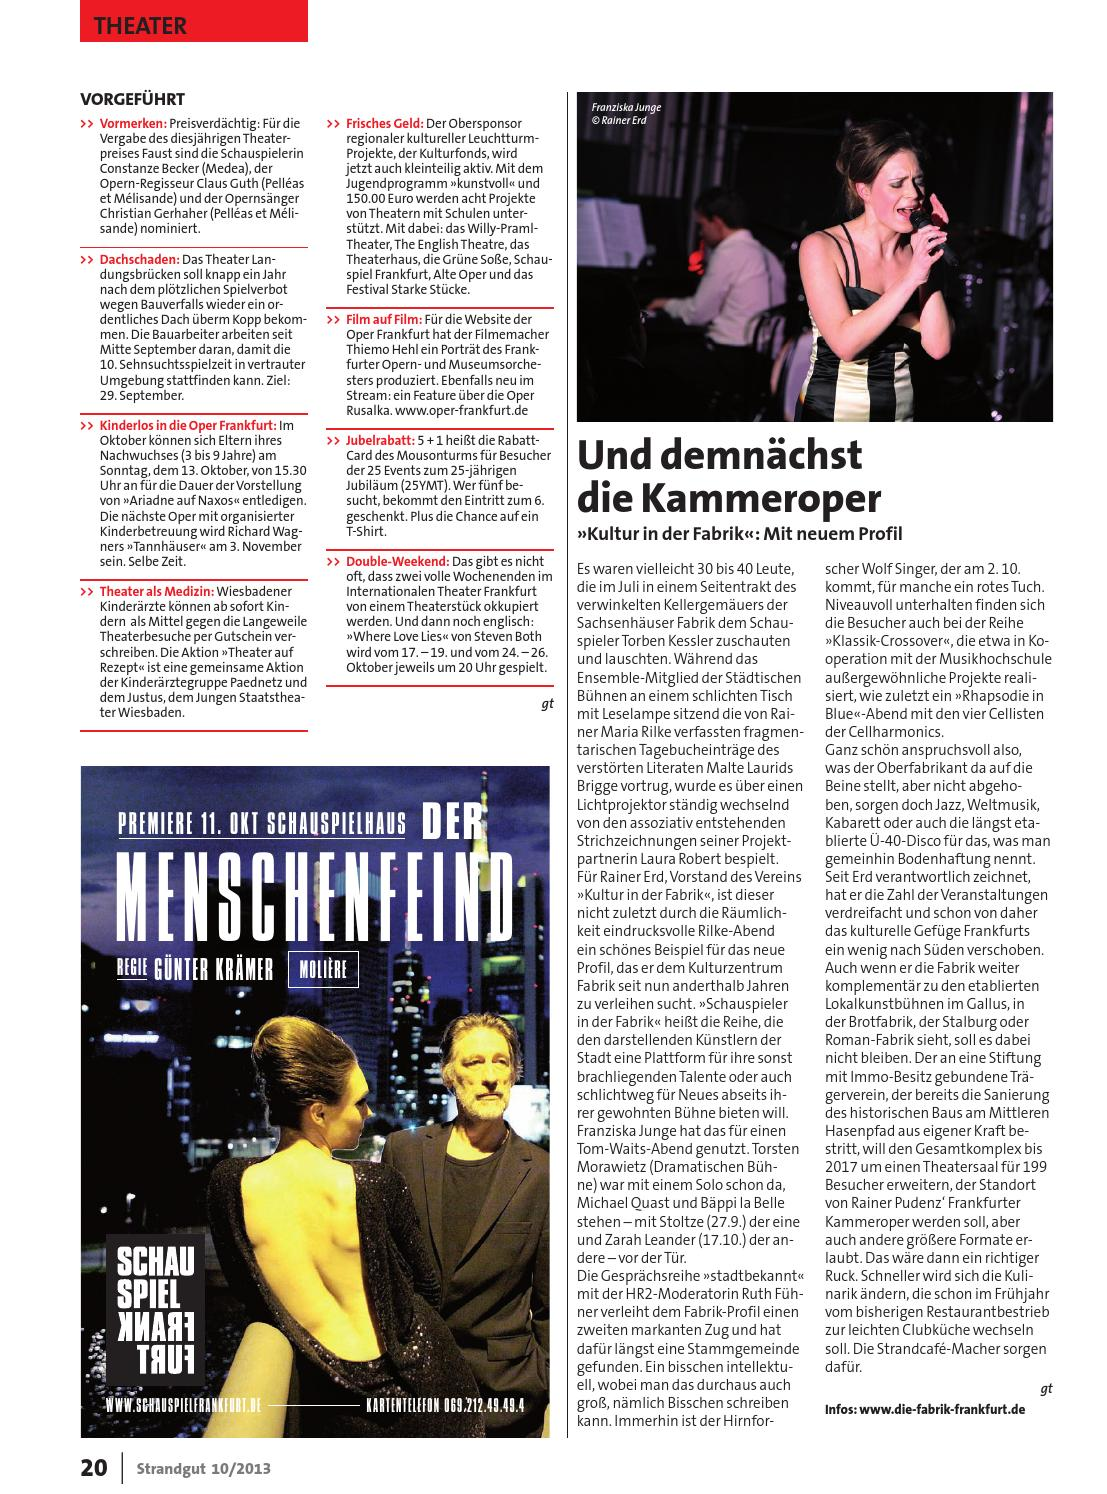 Strangut Kulturmagazin 10 2013 By Strandgut Kulturmagazin Issuu